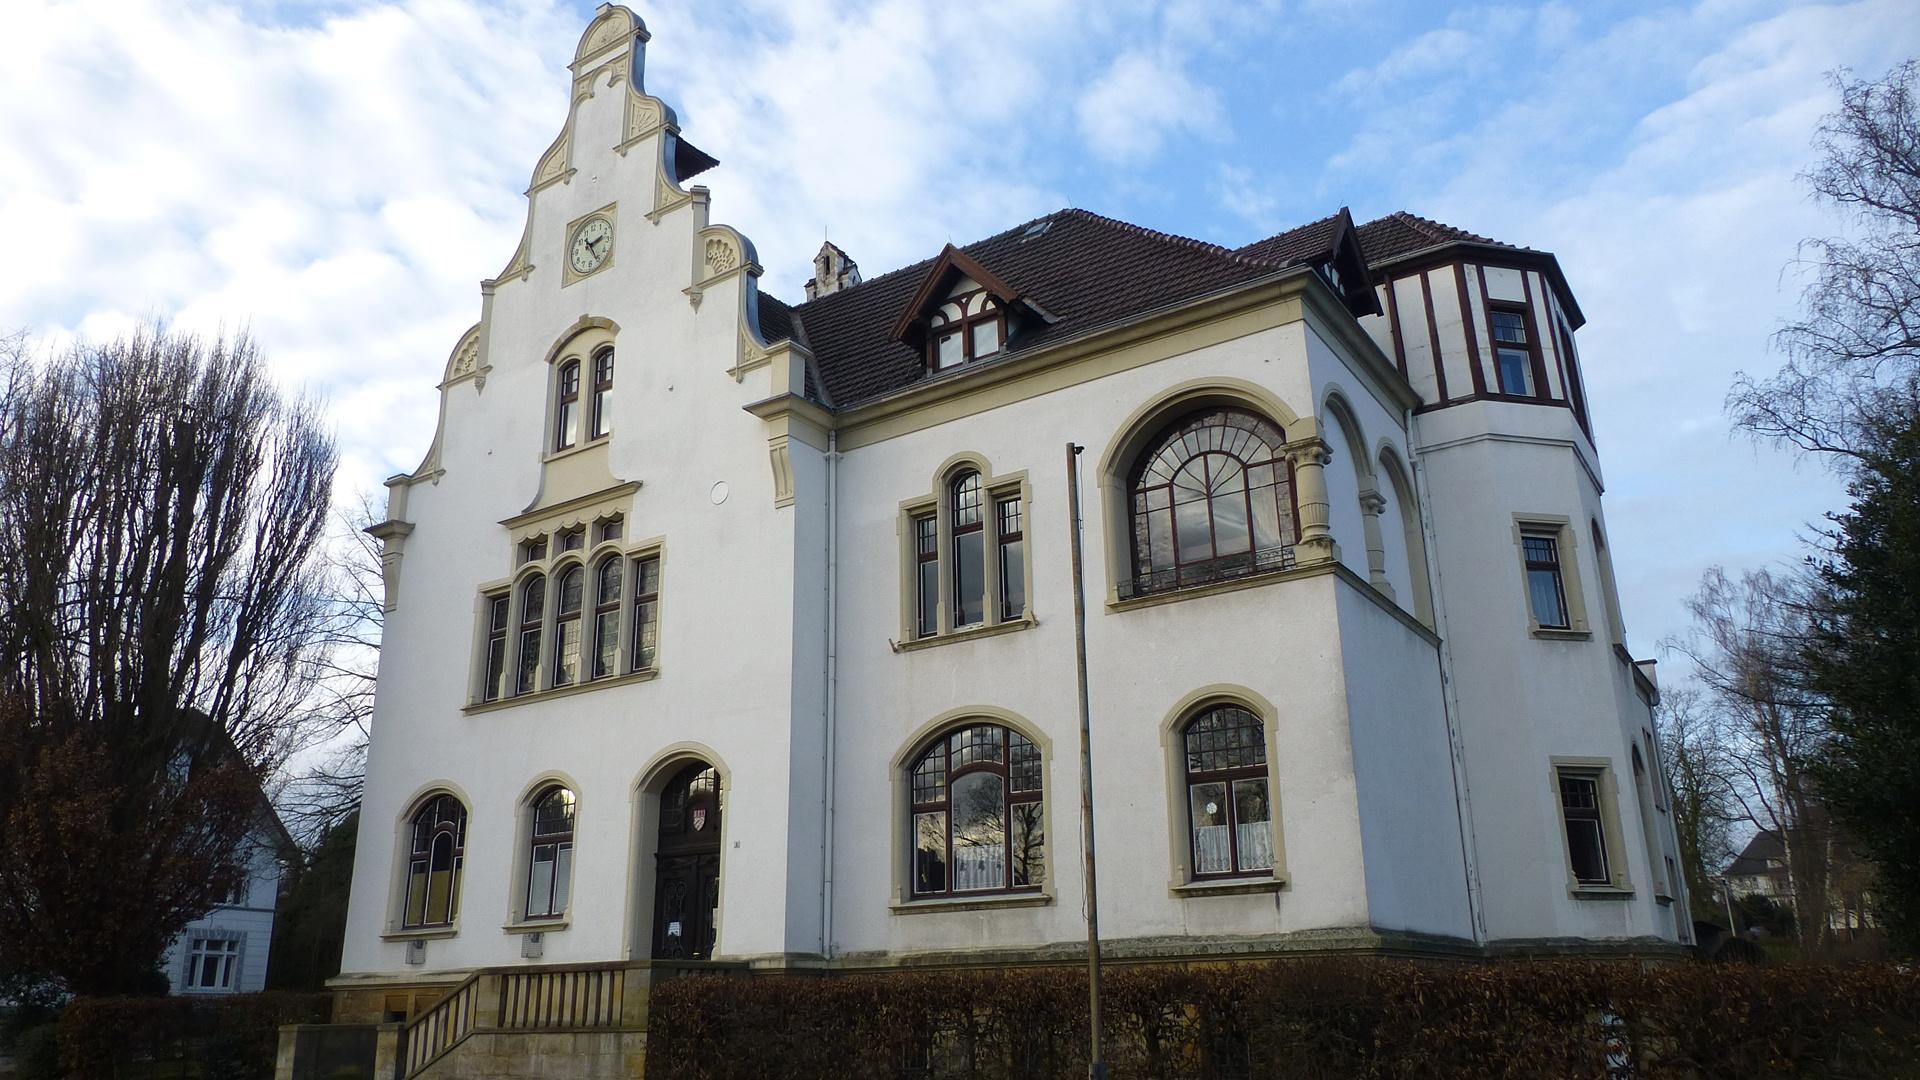 Das Amtshaus Ennigloh